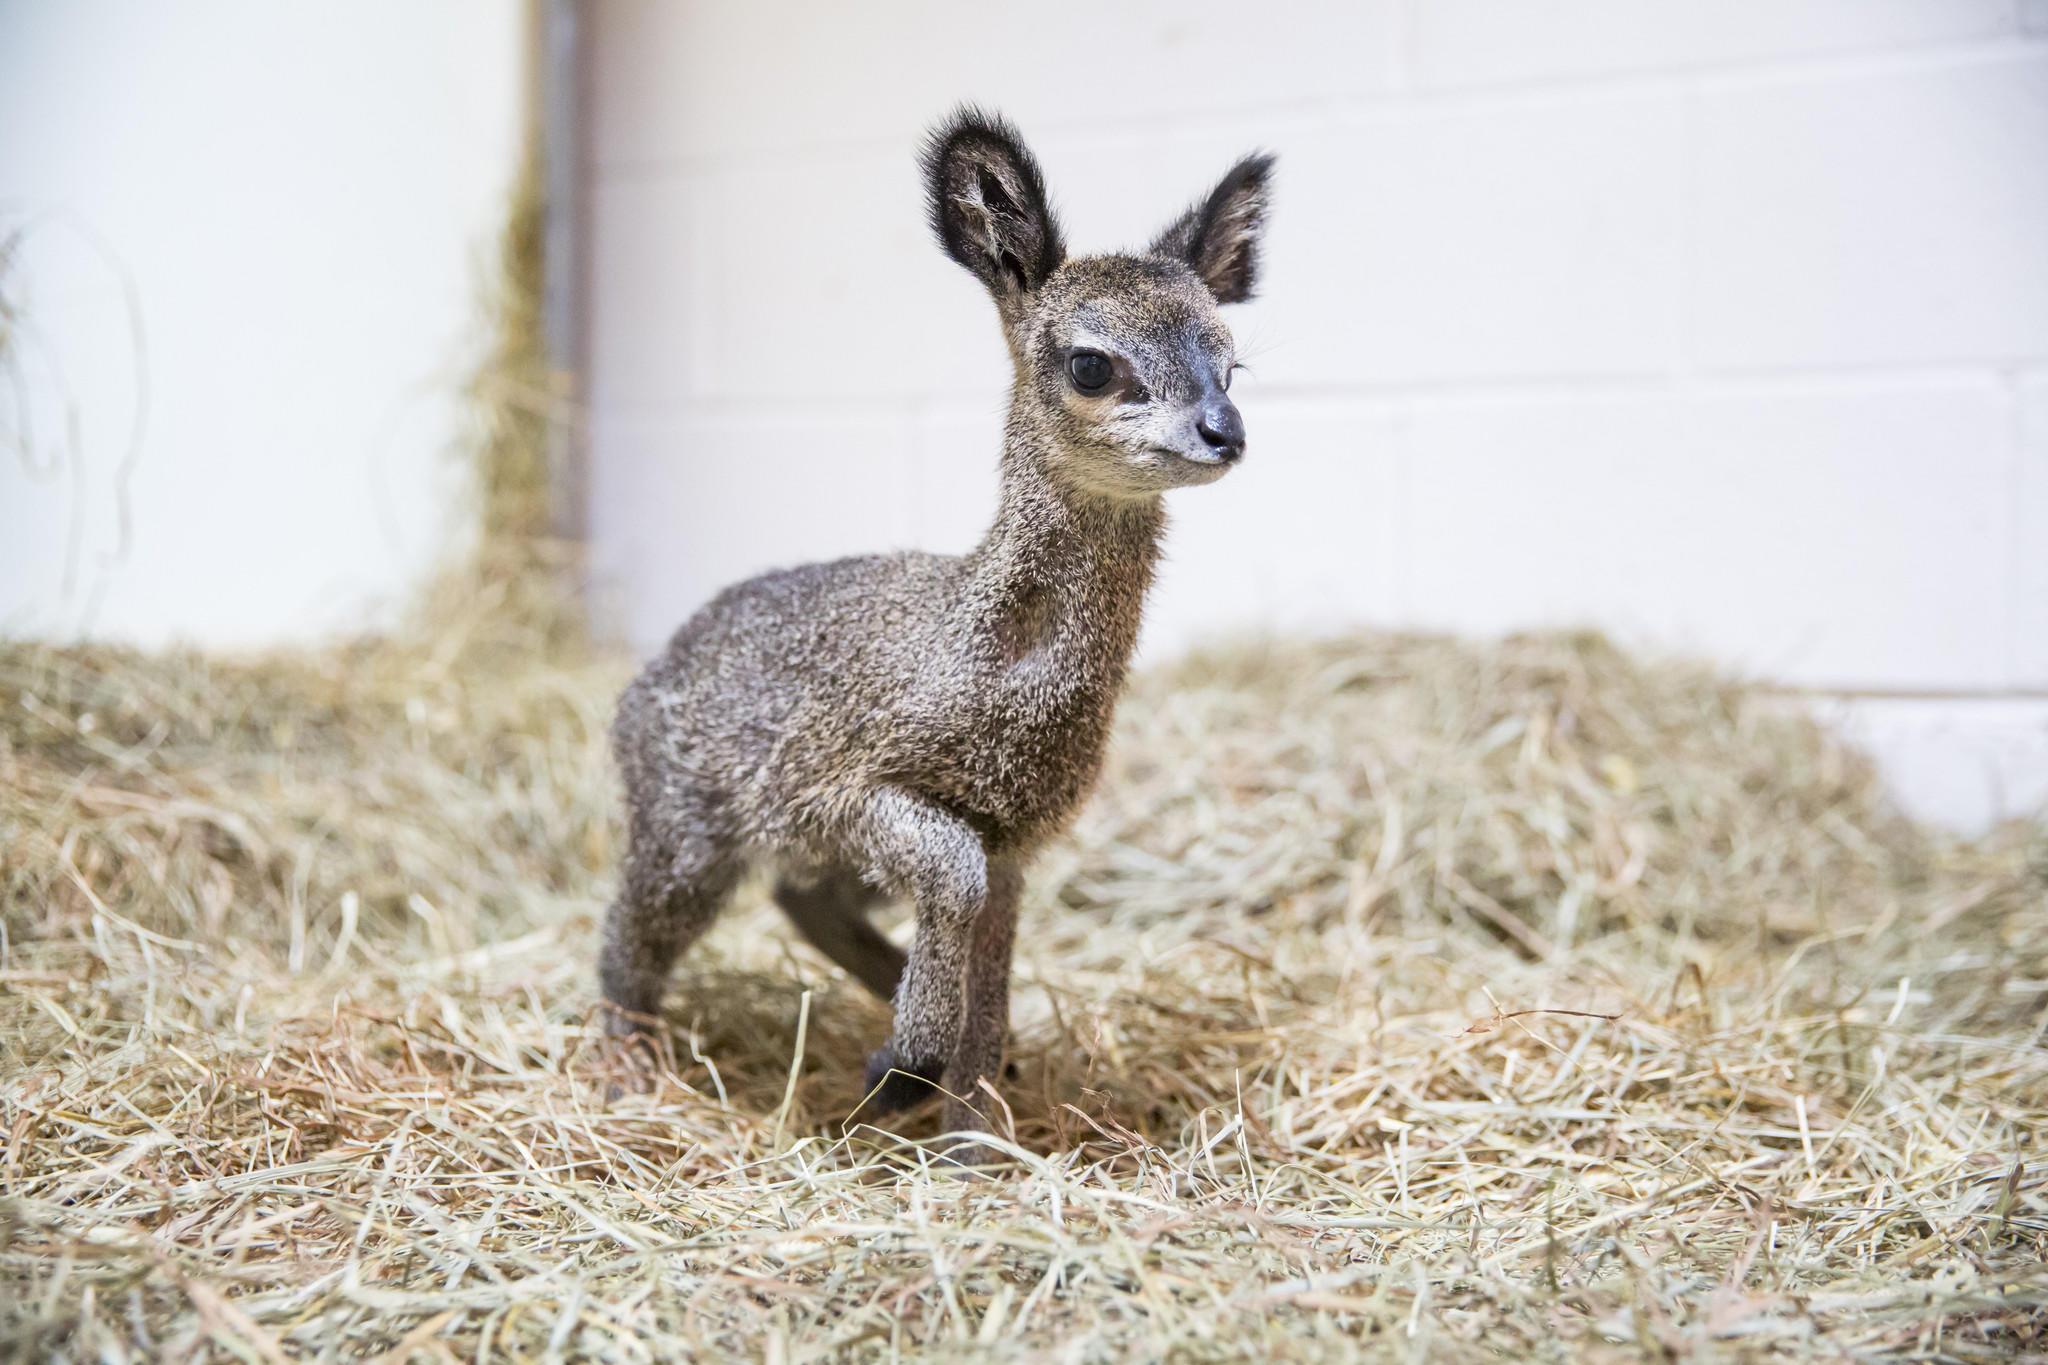 Lincoln Park Zoo baby klipspringer, a dwarf antelope.